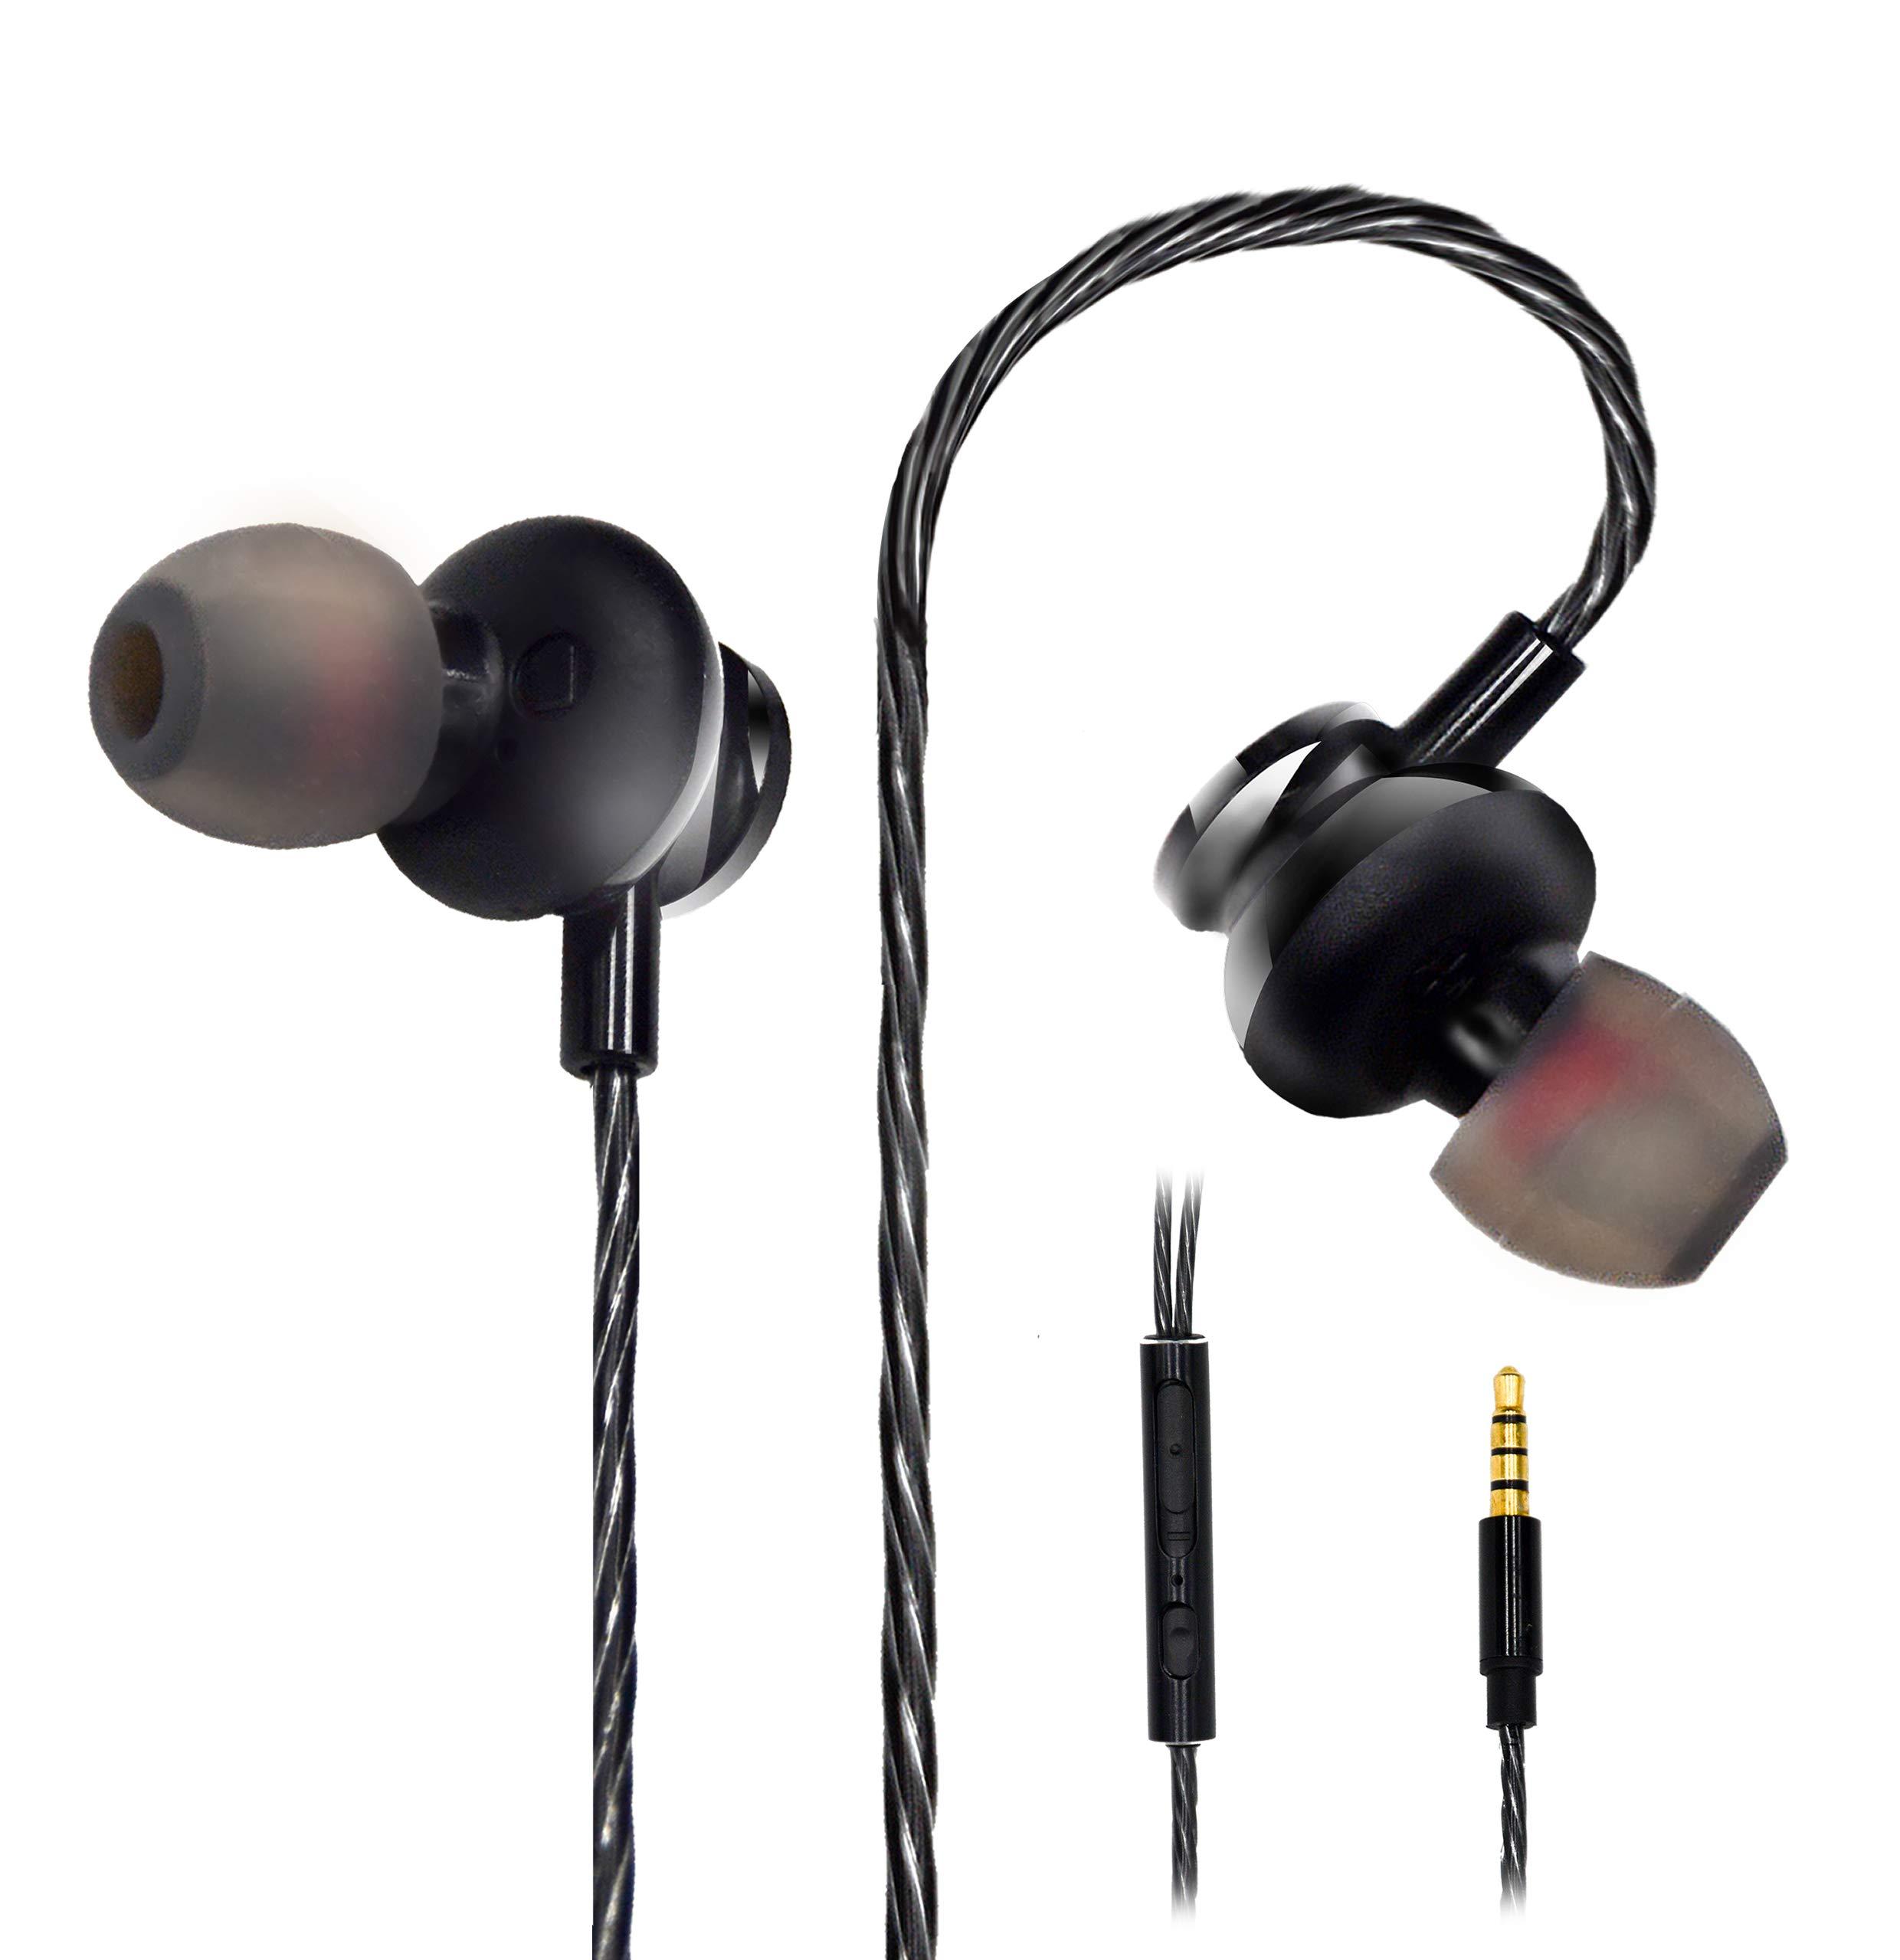 Headphones with Microphone Senhomtog Sport Headphones Noise Cancelling Earbud Headphones On-Ear Headphones Extra Bass – Waterproof Wired Earphones 3.5 mm Headphones with Volume Control Earbud Headset